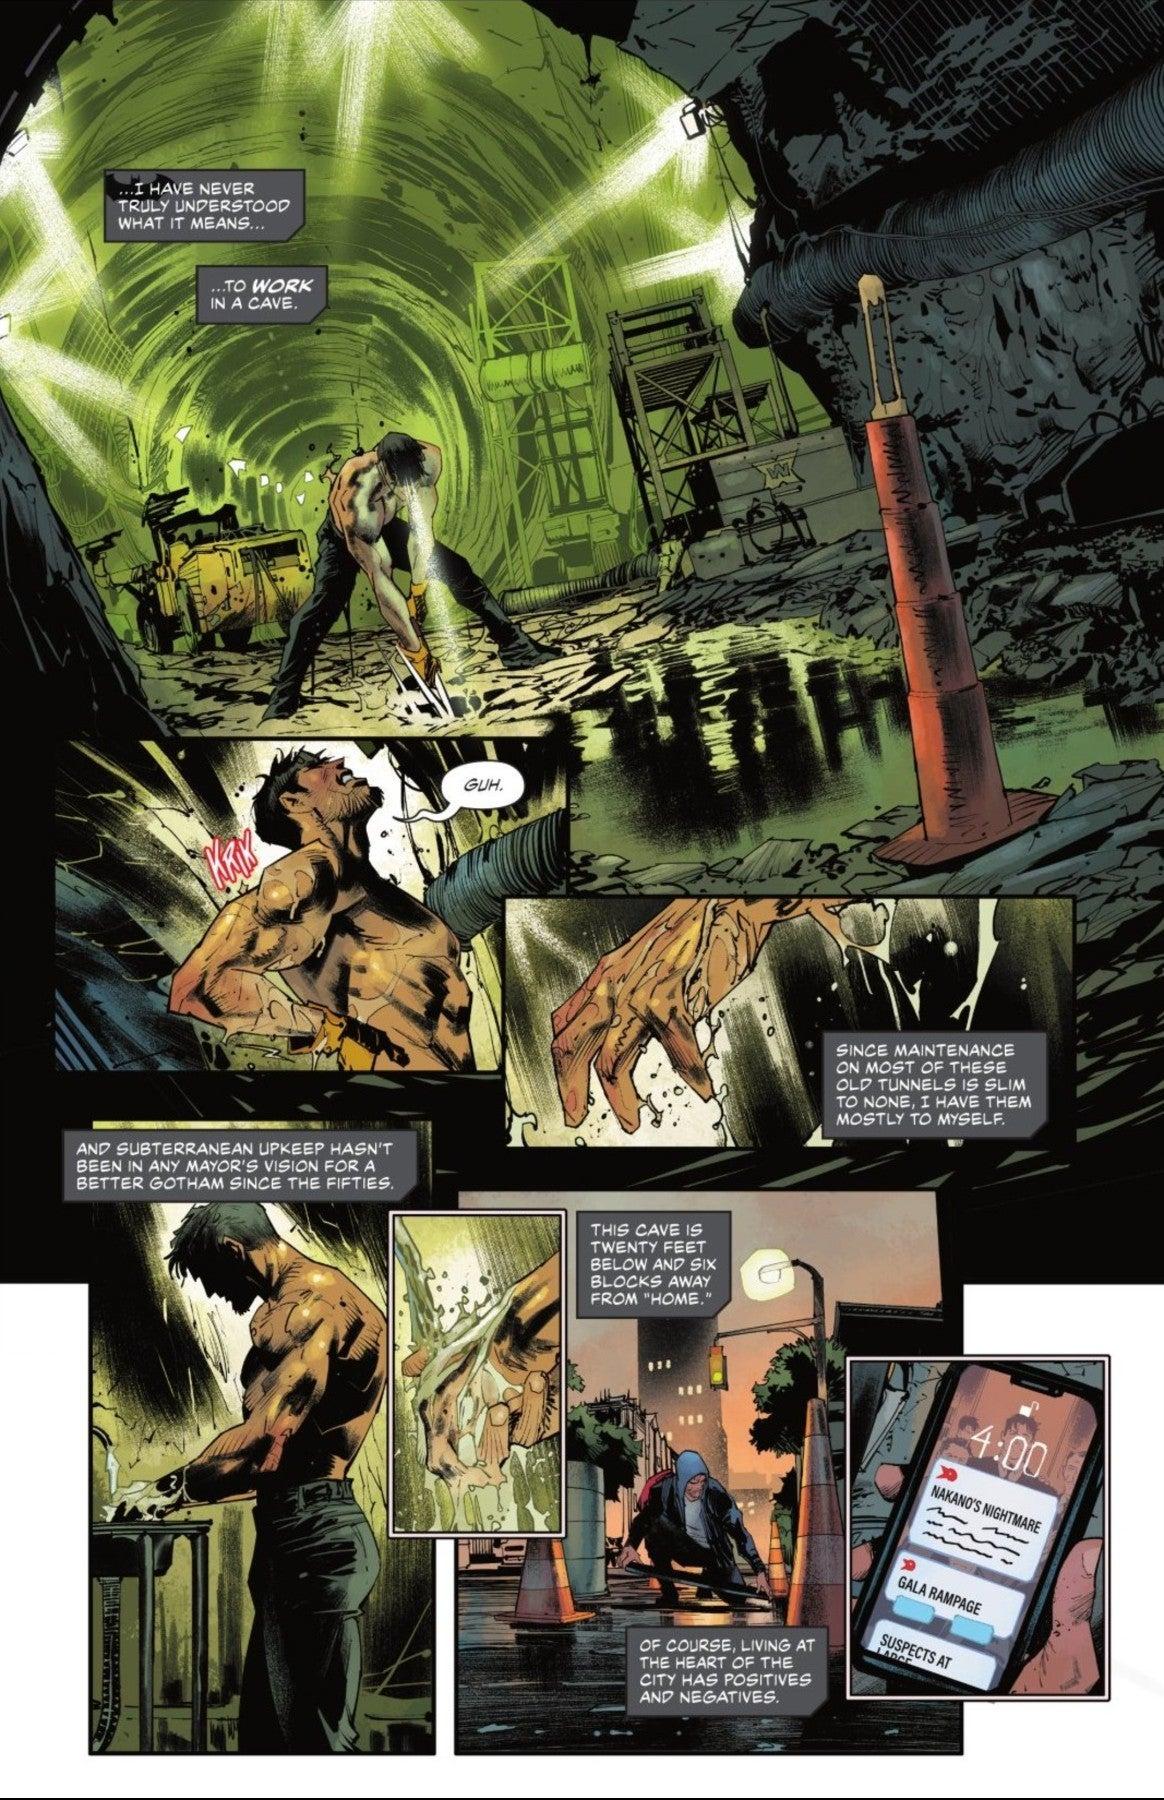 Detective Comics 1034 Spoilers